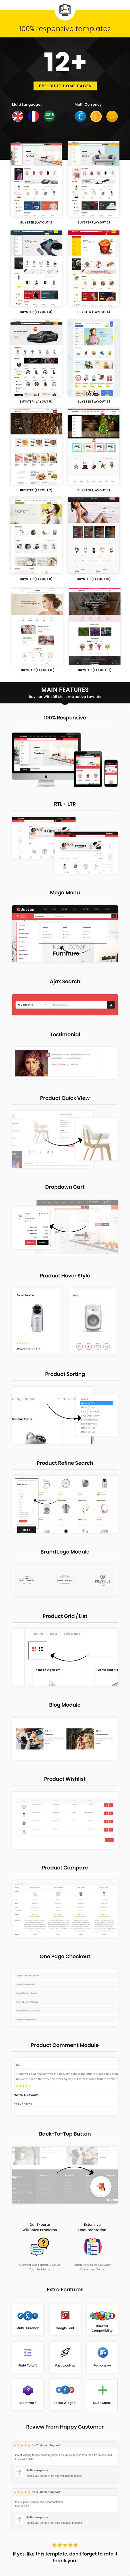 Buyster Multipurpose - Responsive Opencart 3.0 Theme - 4